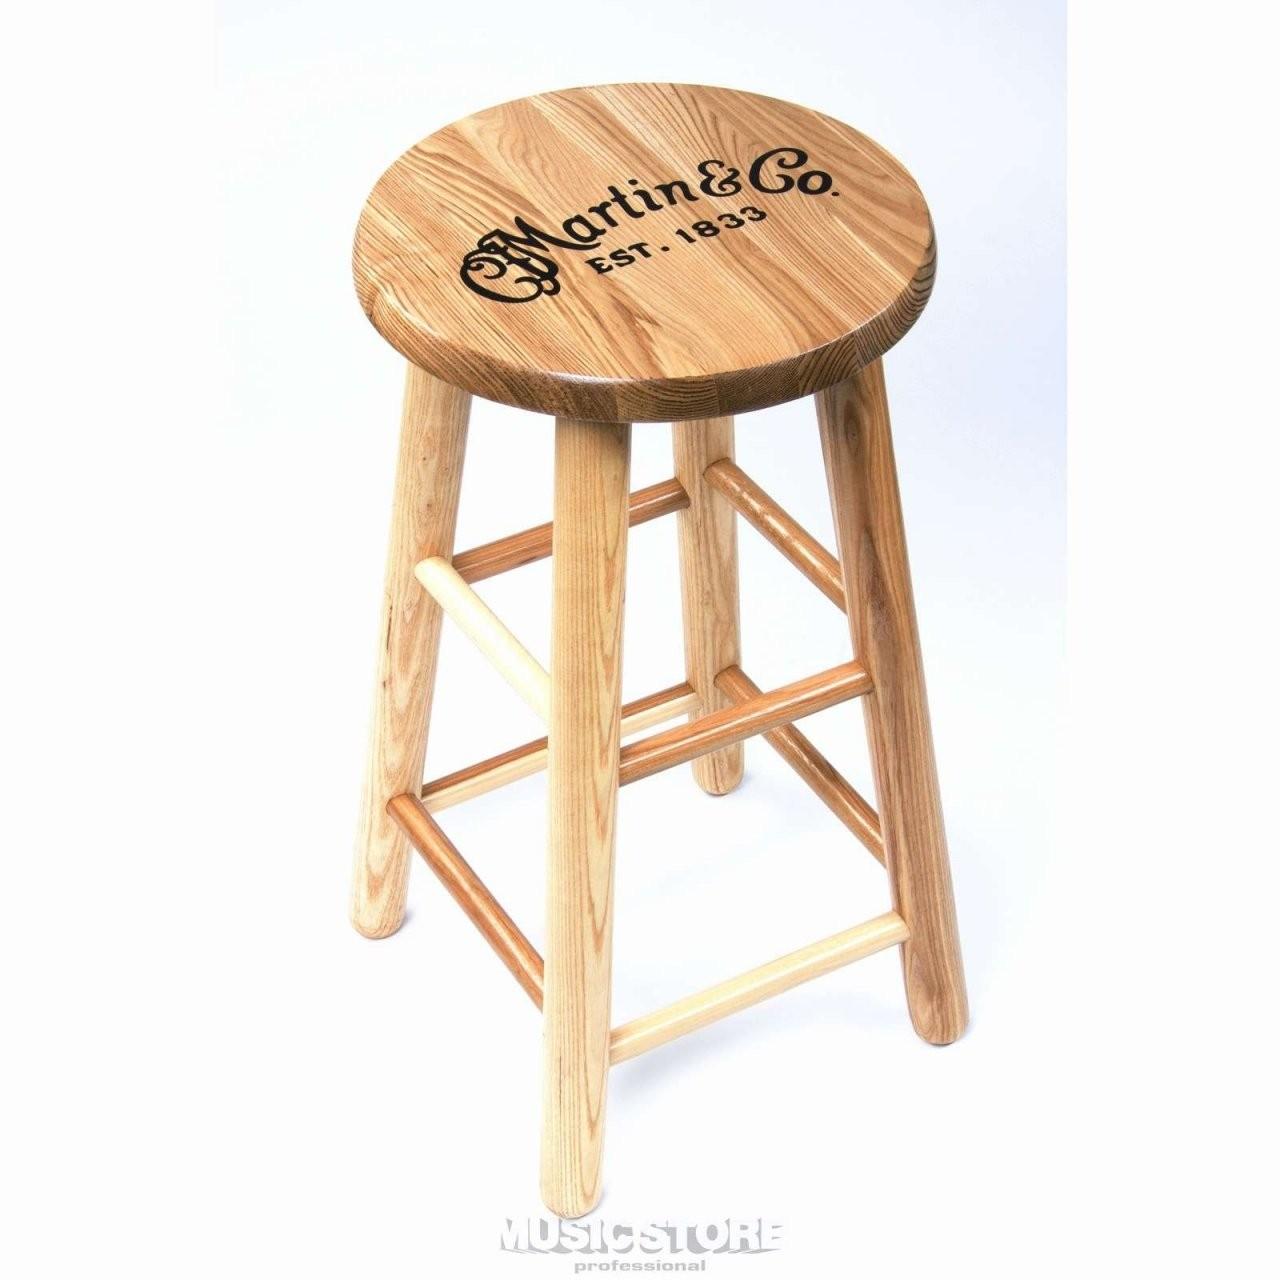 Ocker Eiche Holz Kunststoff Barhocker Online Kaufen Barhocker Holz von Barhocker Holz Selber Bauen Photo